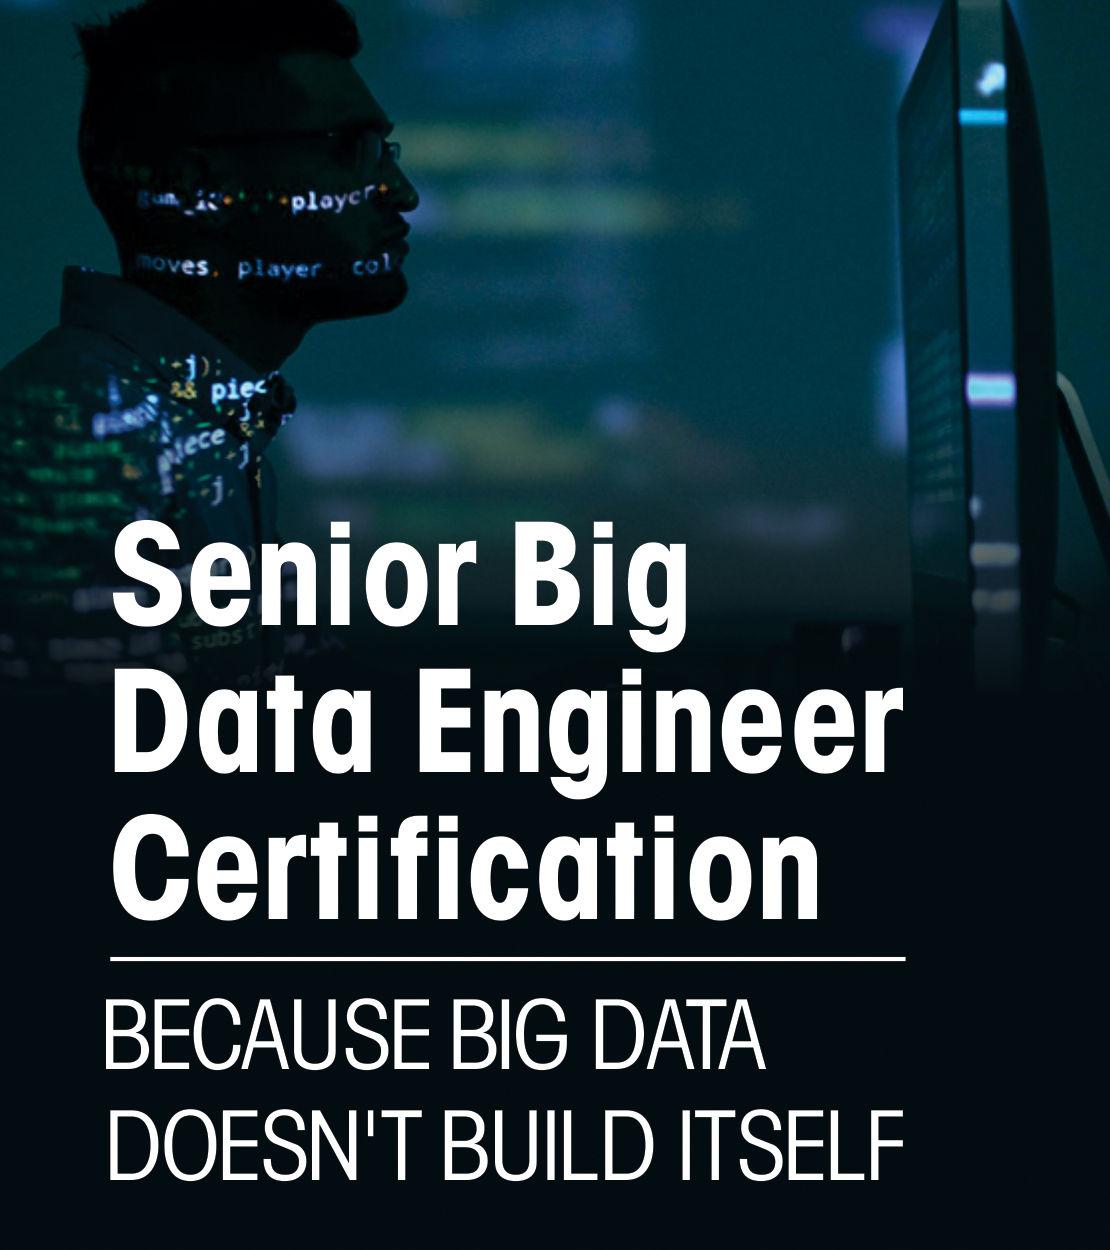 Senior Big Data Engineer Certification - Because Big Data Doesn't Build Itself